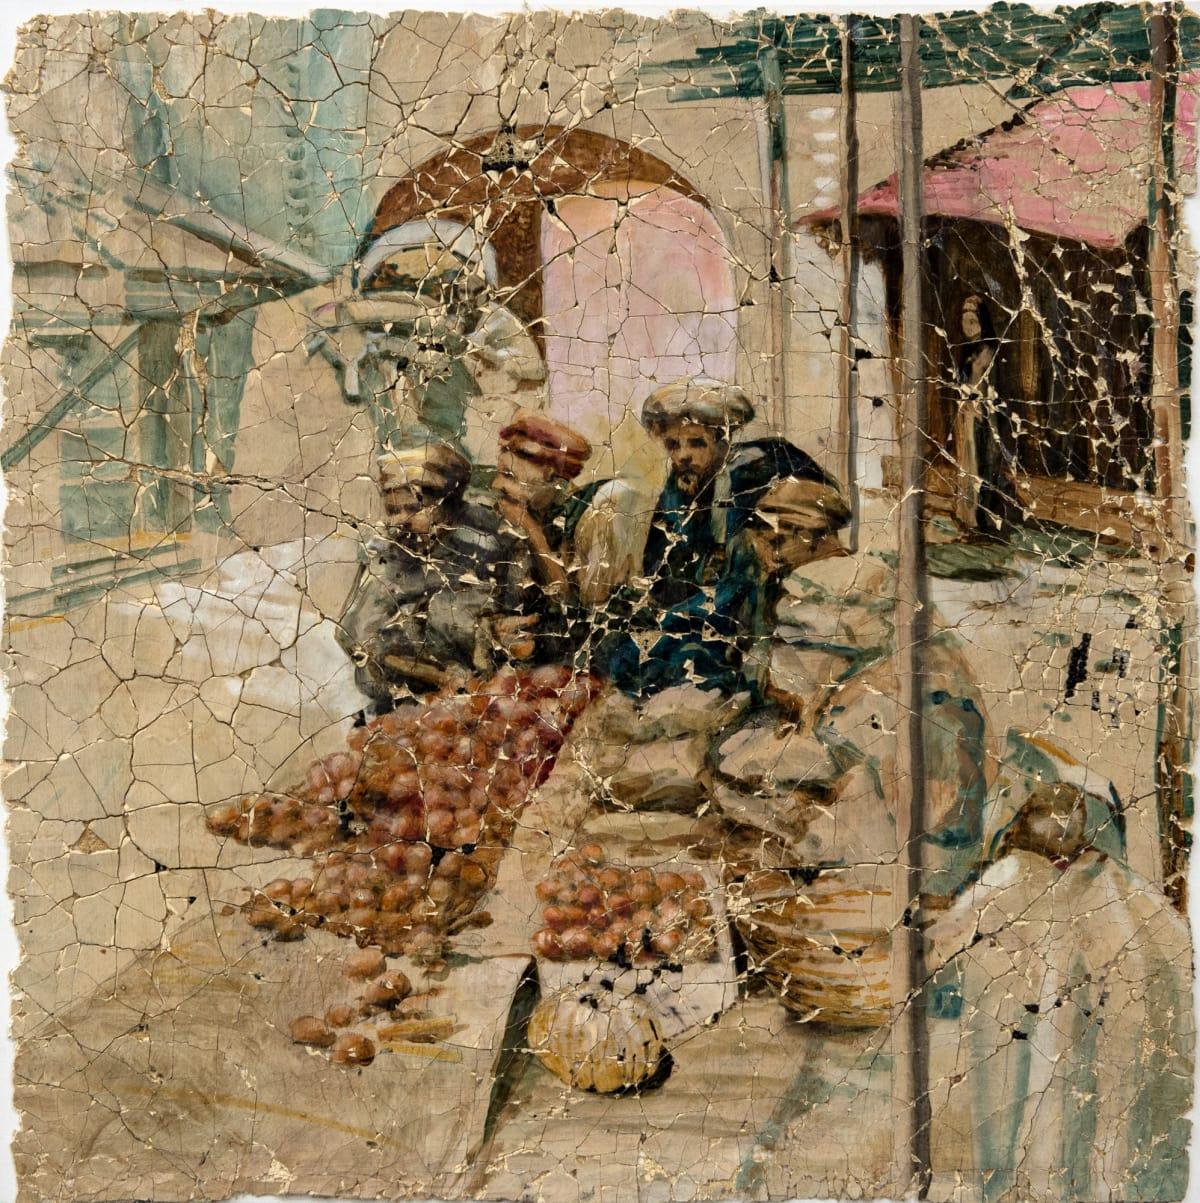 Derek Cowie Hodgkins on Cadmium White (Tangiers, 1905) Oil on prepared plaster 30.3 x 30.3 in 77 x 77 cm